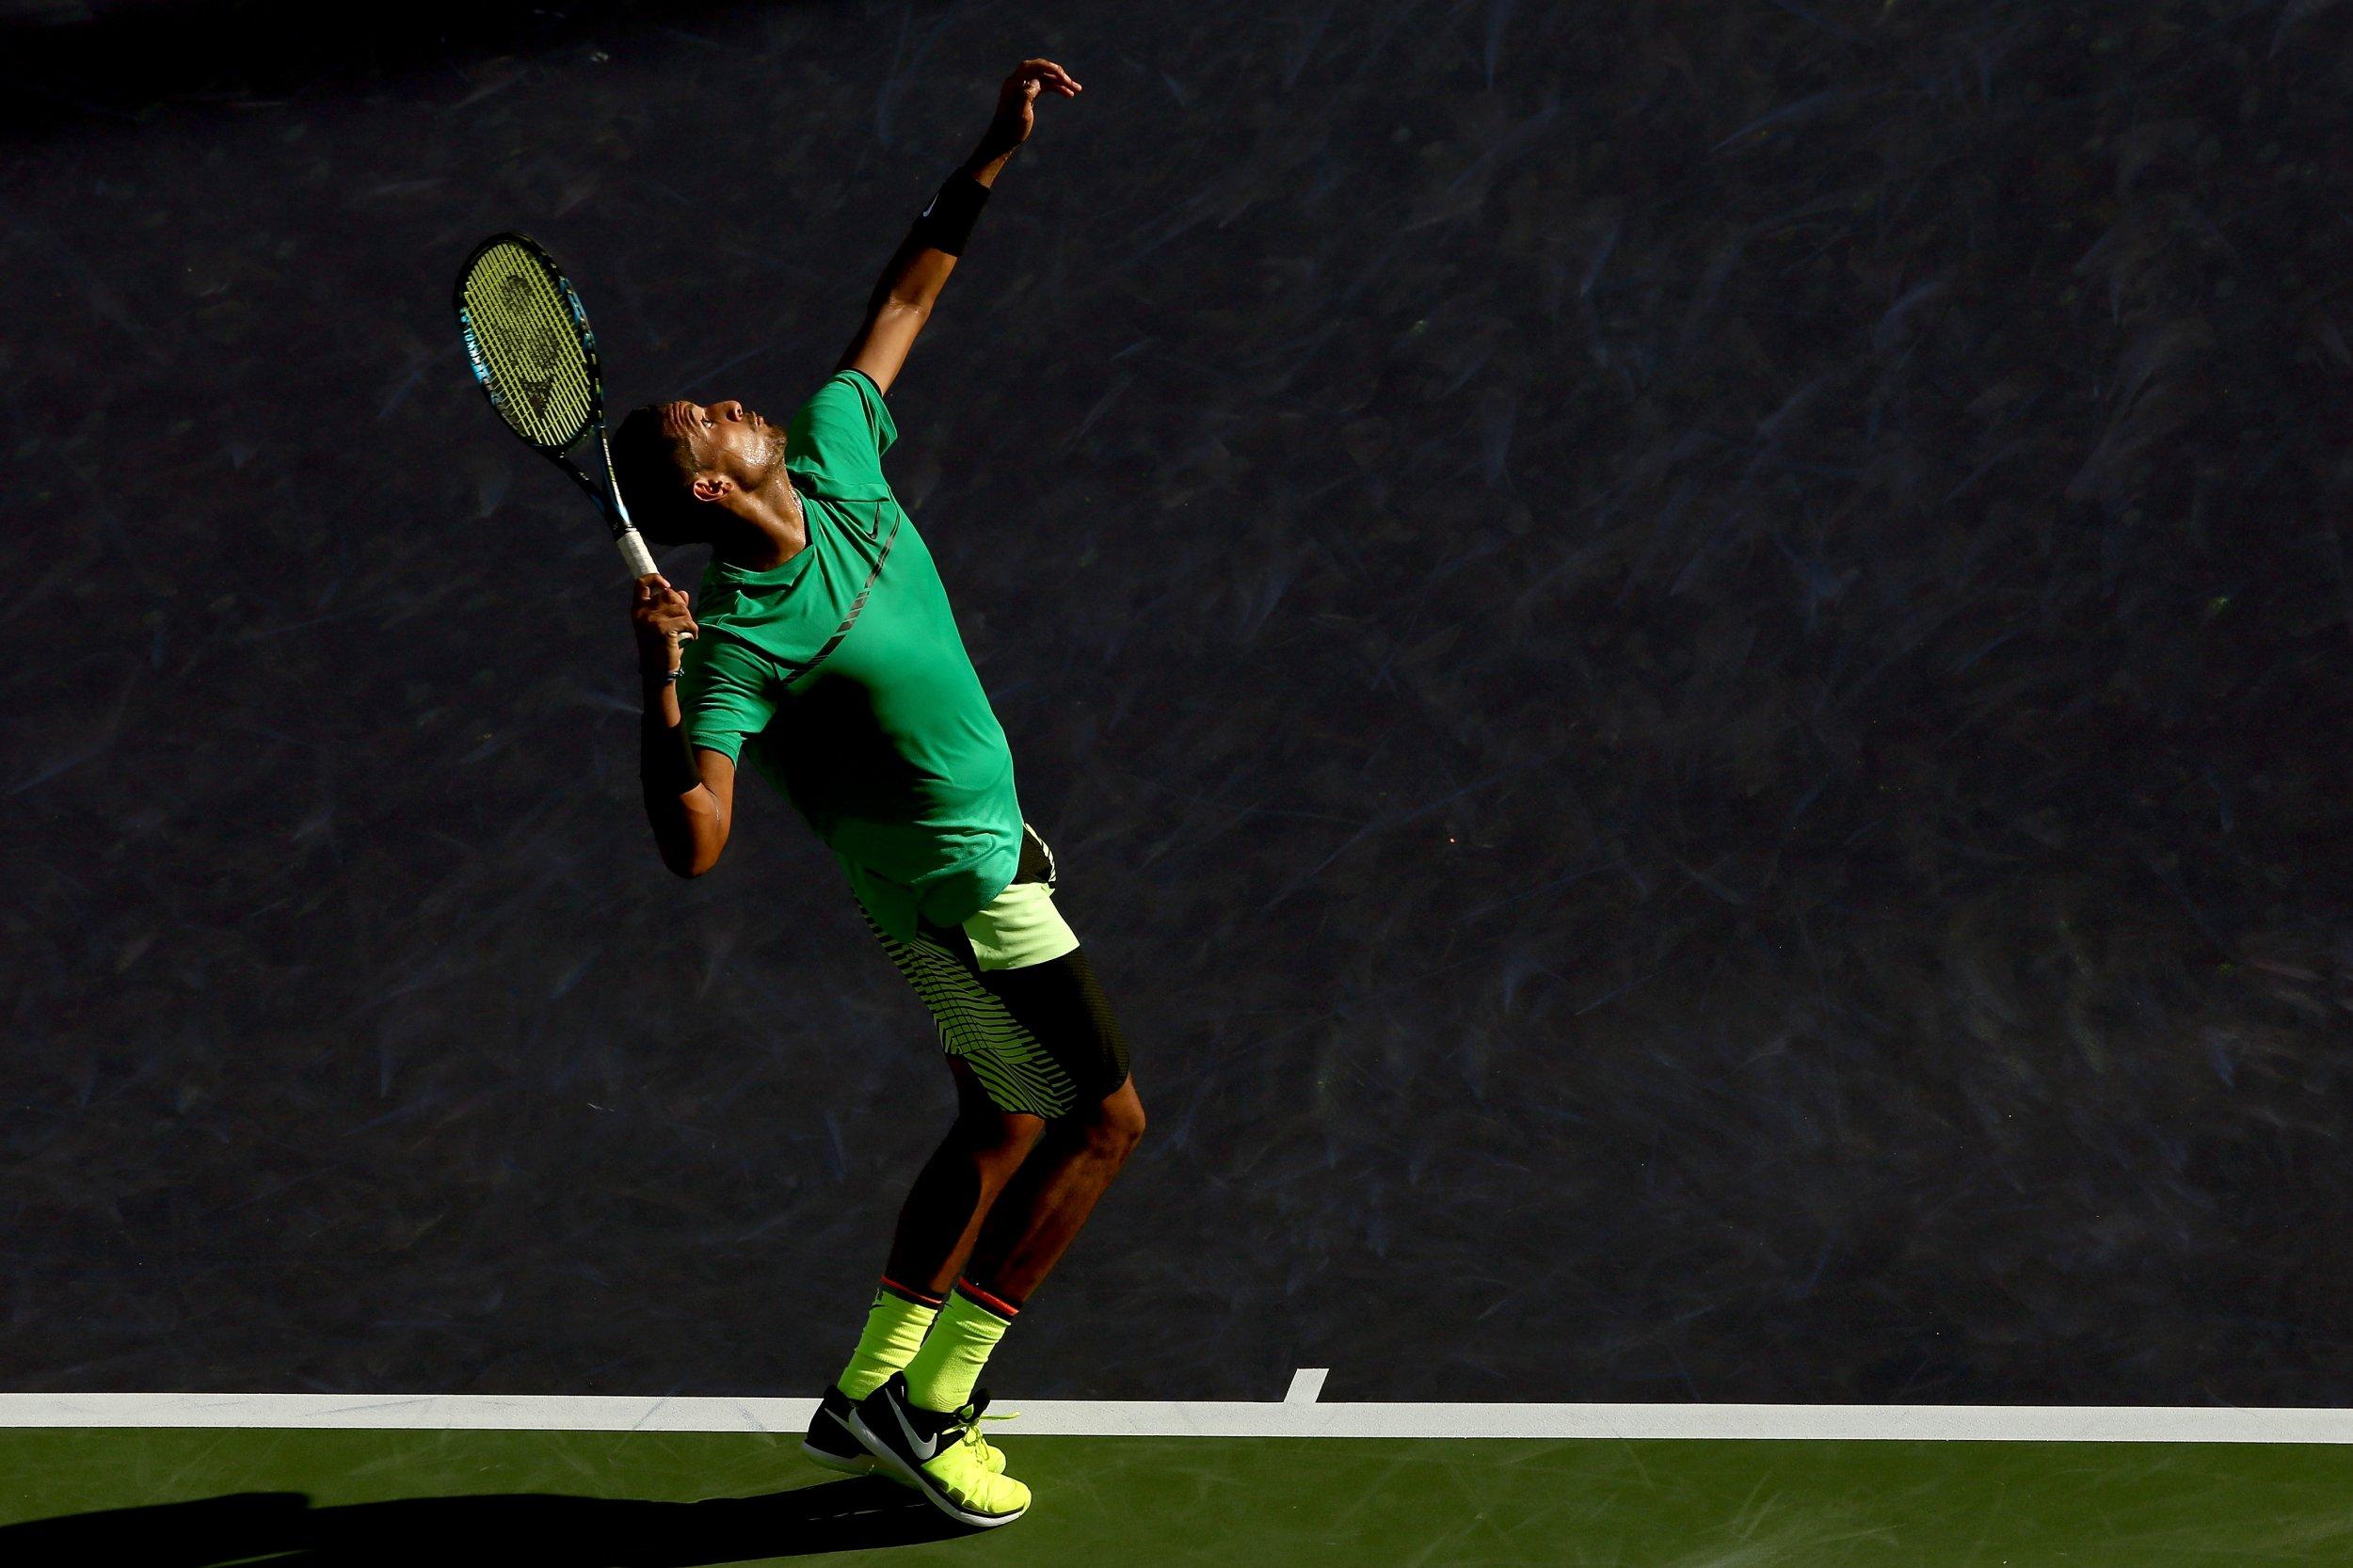 World number 16 tennis player Nick Kyrgios.